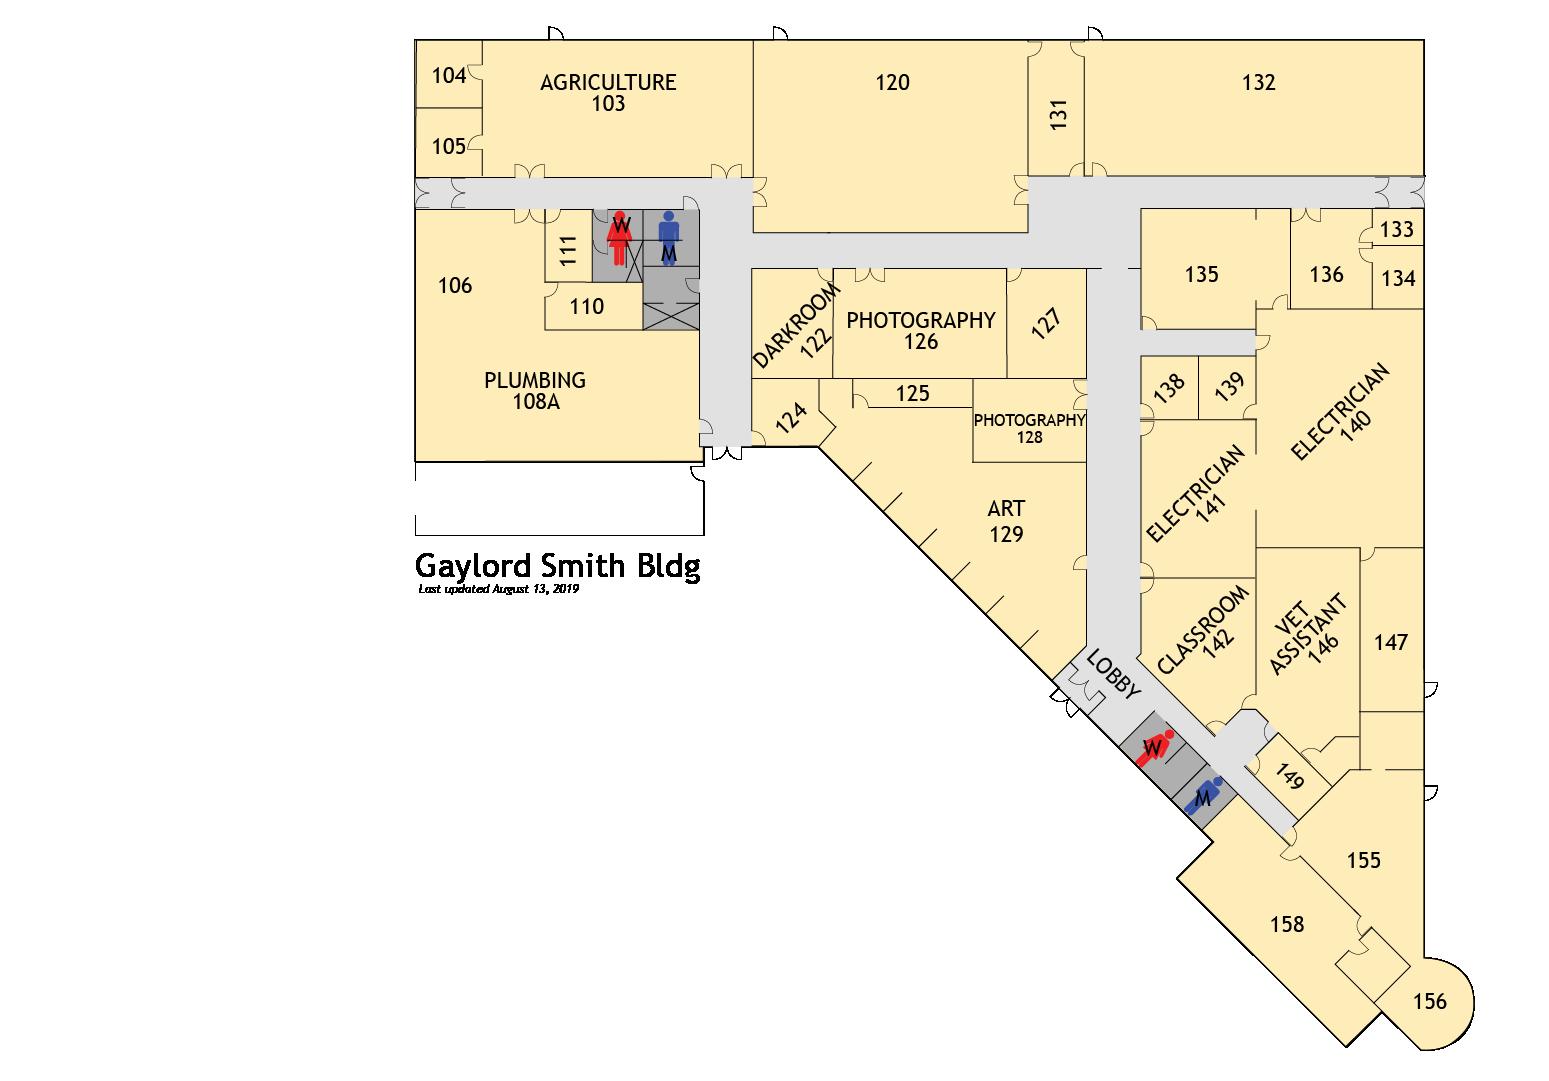 Rockland Community College Campus Map.Witcc Campus Maps